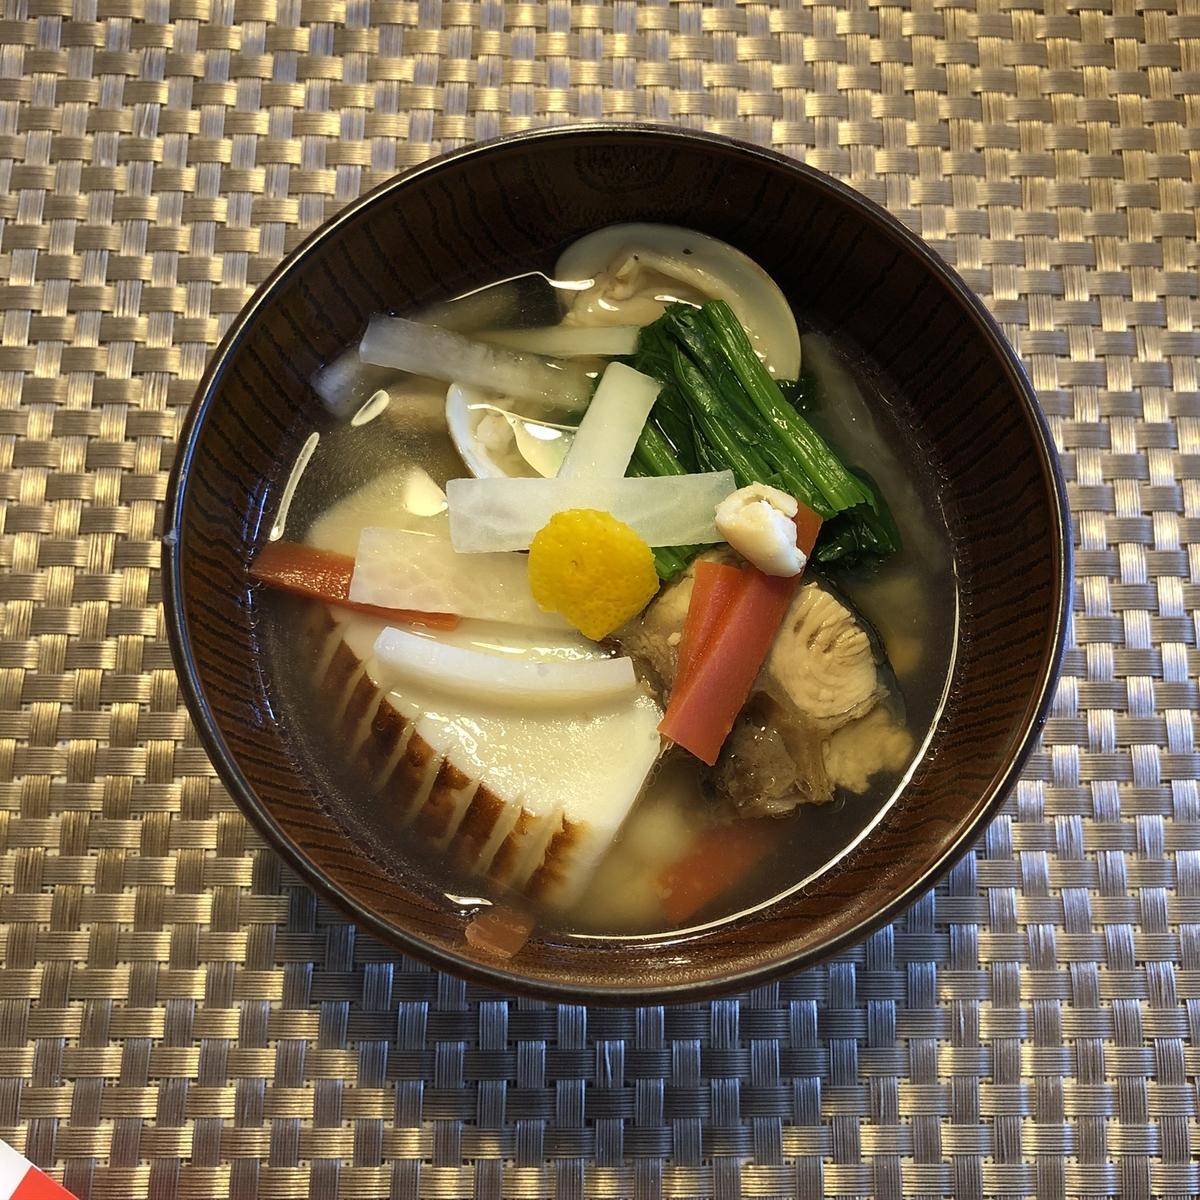 f:id:shiratsume:20200104082029j:plain